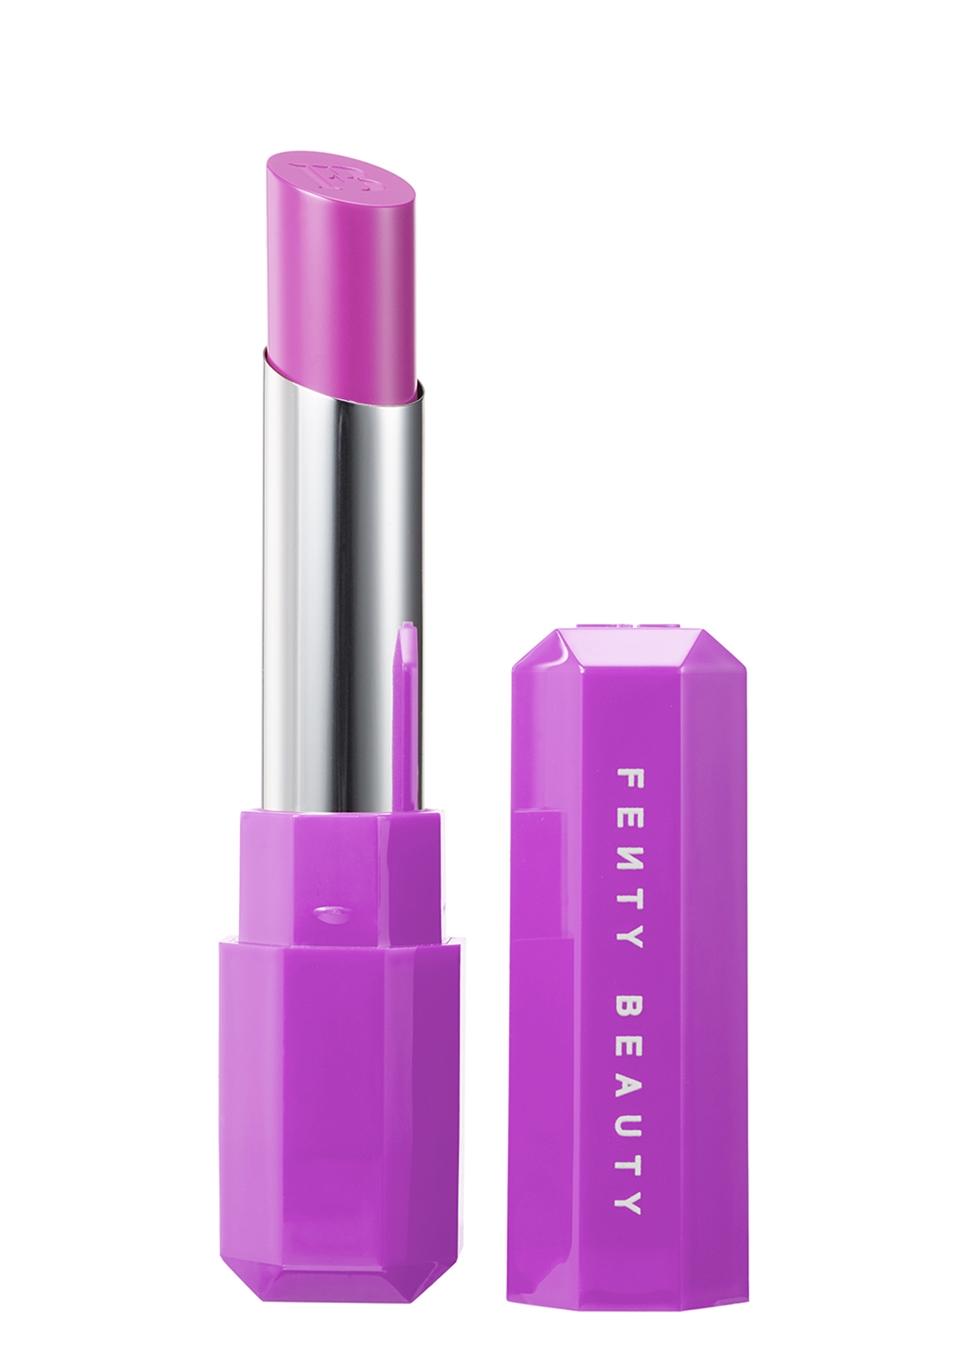 6c633a2d6876 Rihanna Beauty Collection - Fenty Makeup - Harvey Nichols